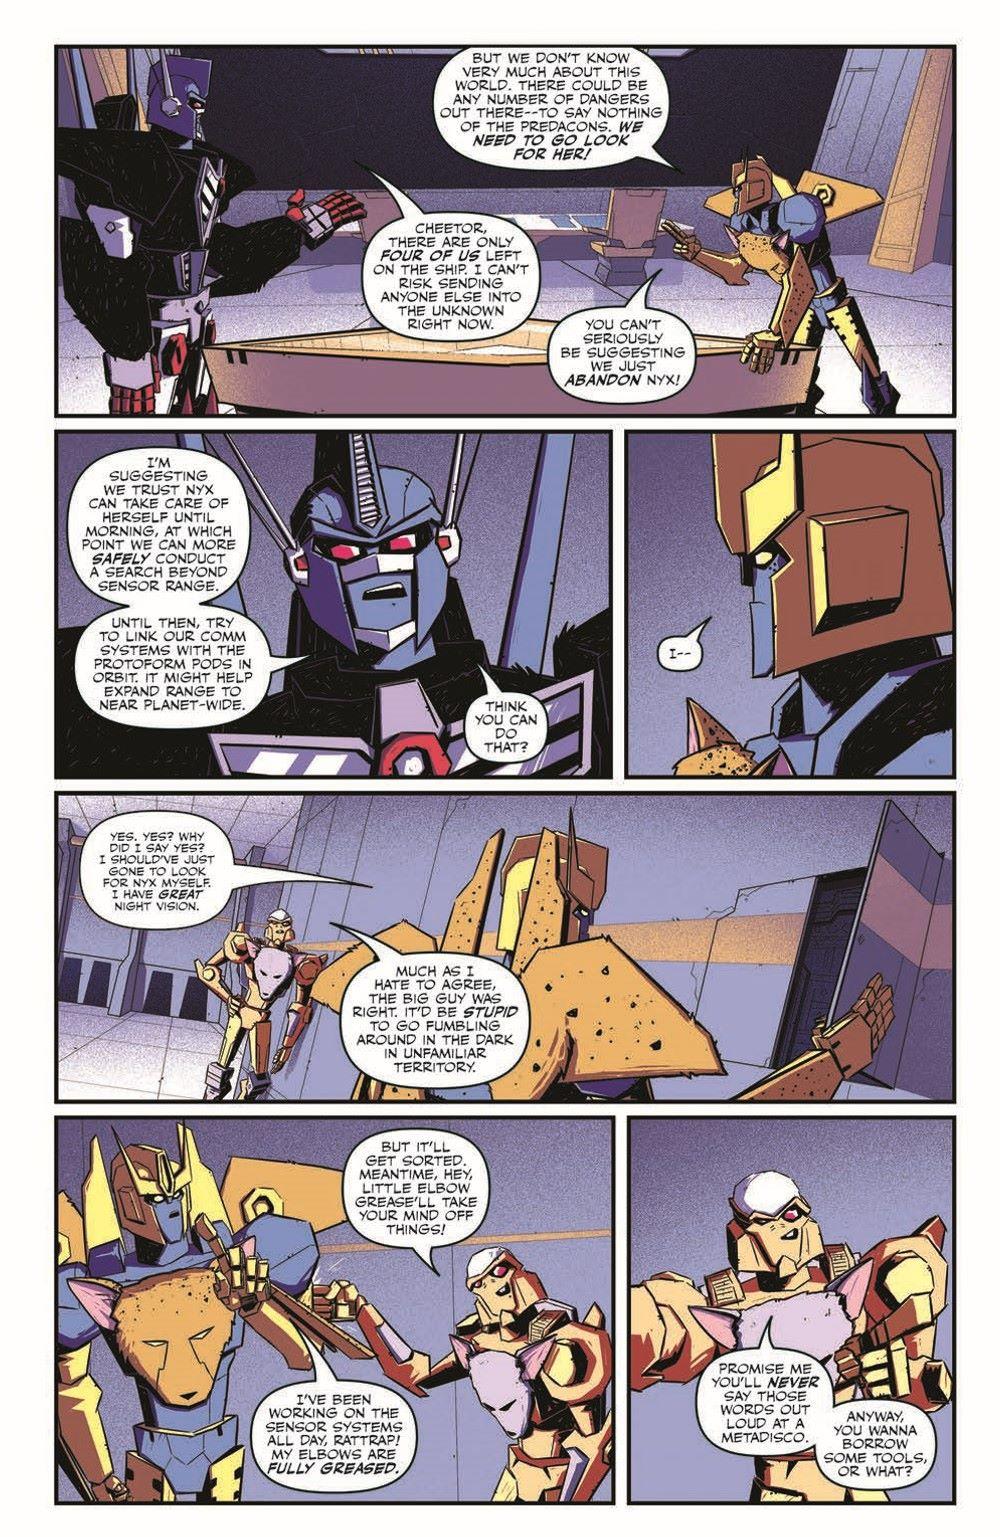 TFBW_03_pr-7 ComicList Previews: TRANSFORMERS BEAST WARS #3